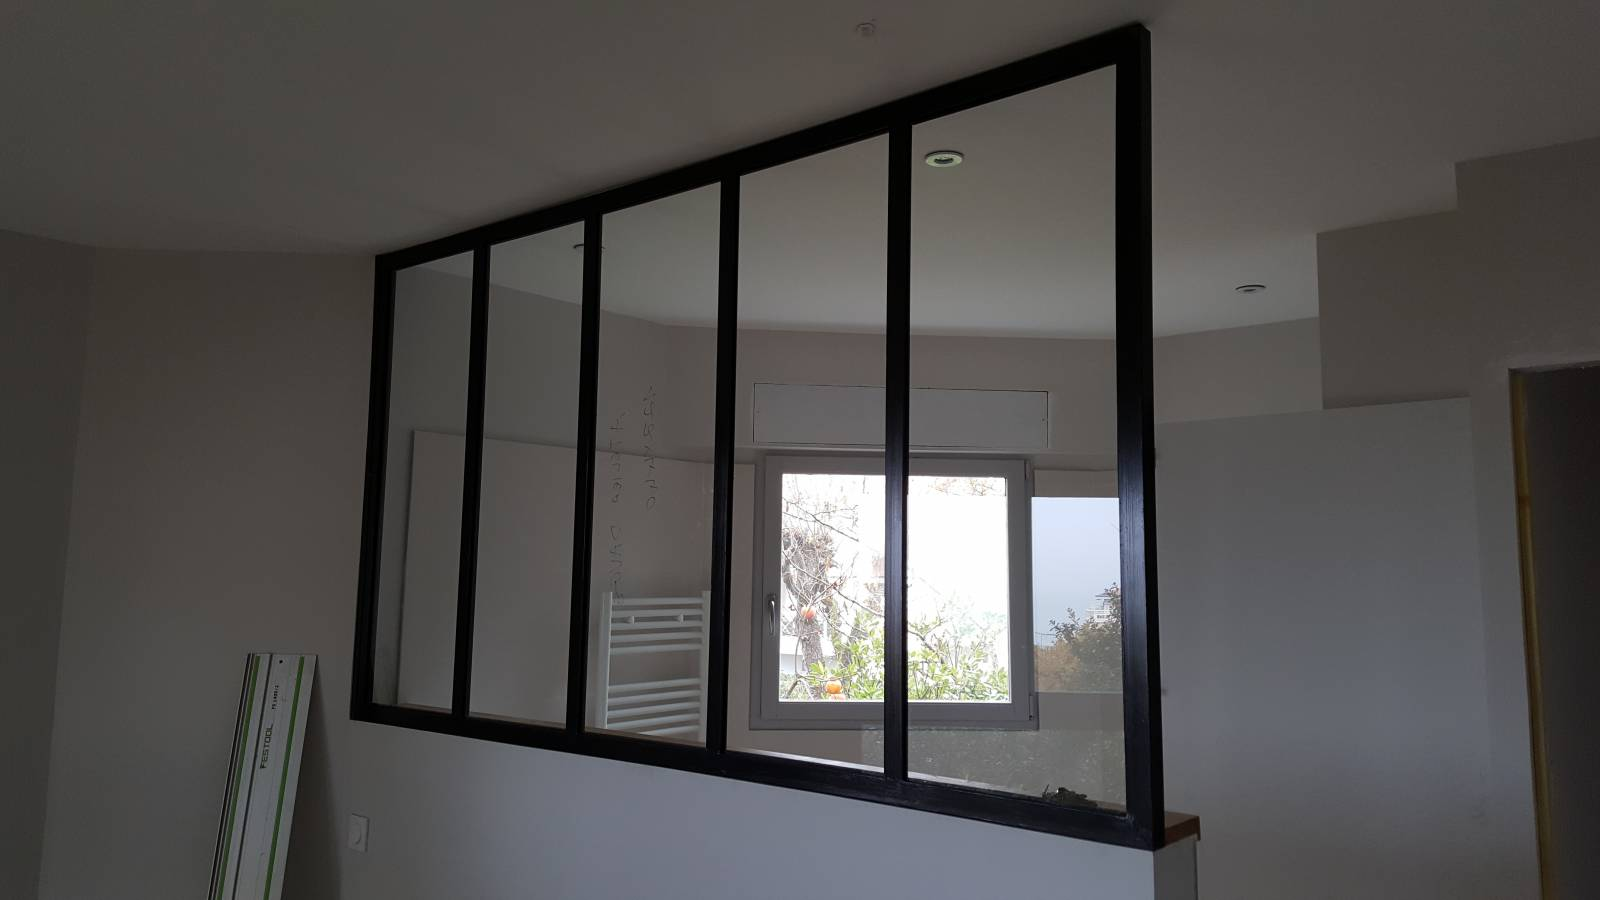 verrieres style industriel fabrication de mobilier bois. Black Bedroom Furniture Sets. Home Design Ideas